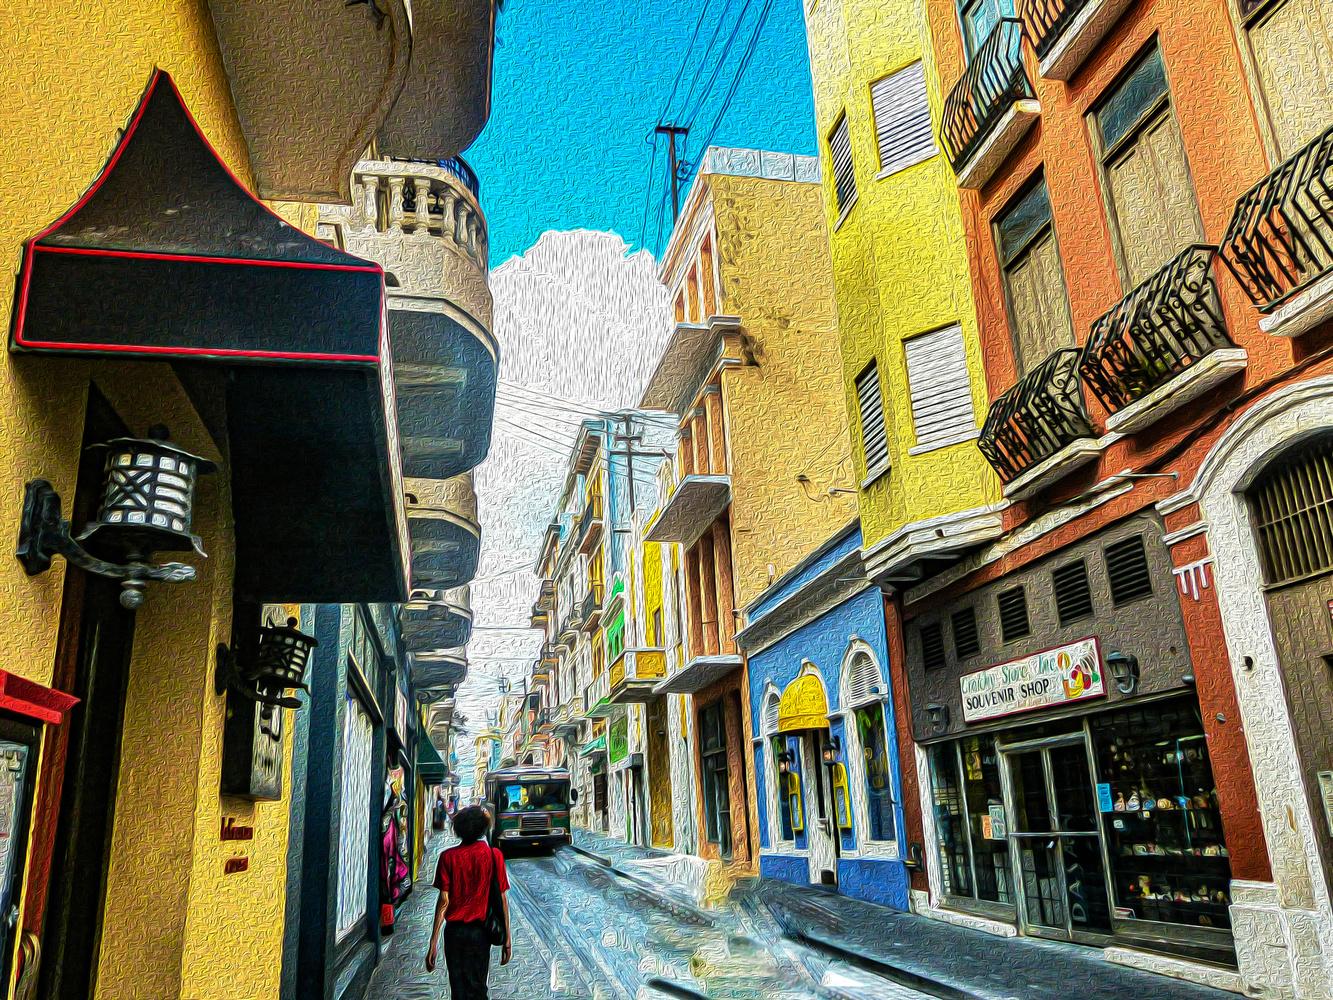 Shopping street of San Juan by Rohit Burra